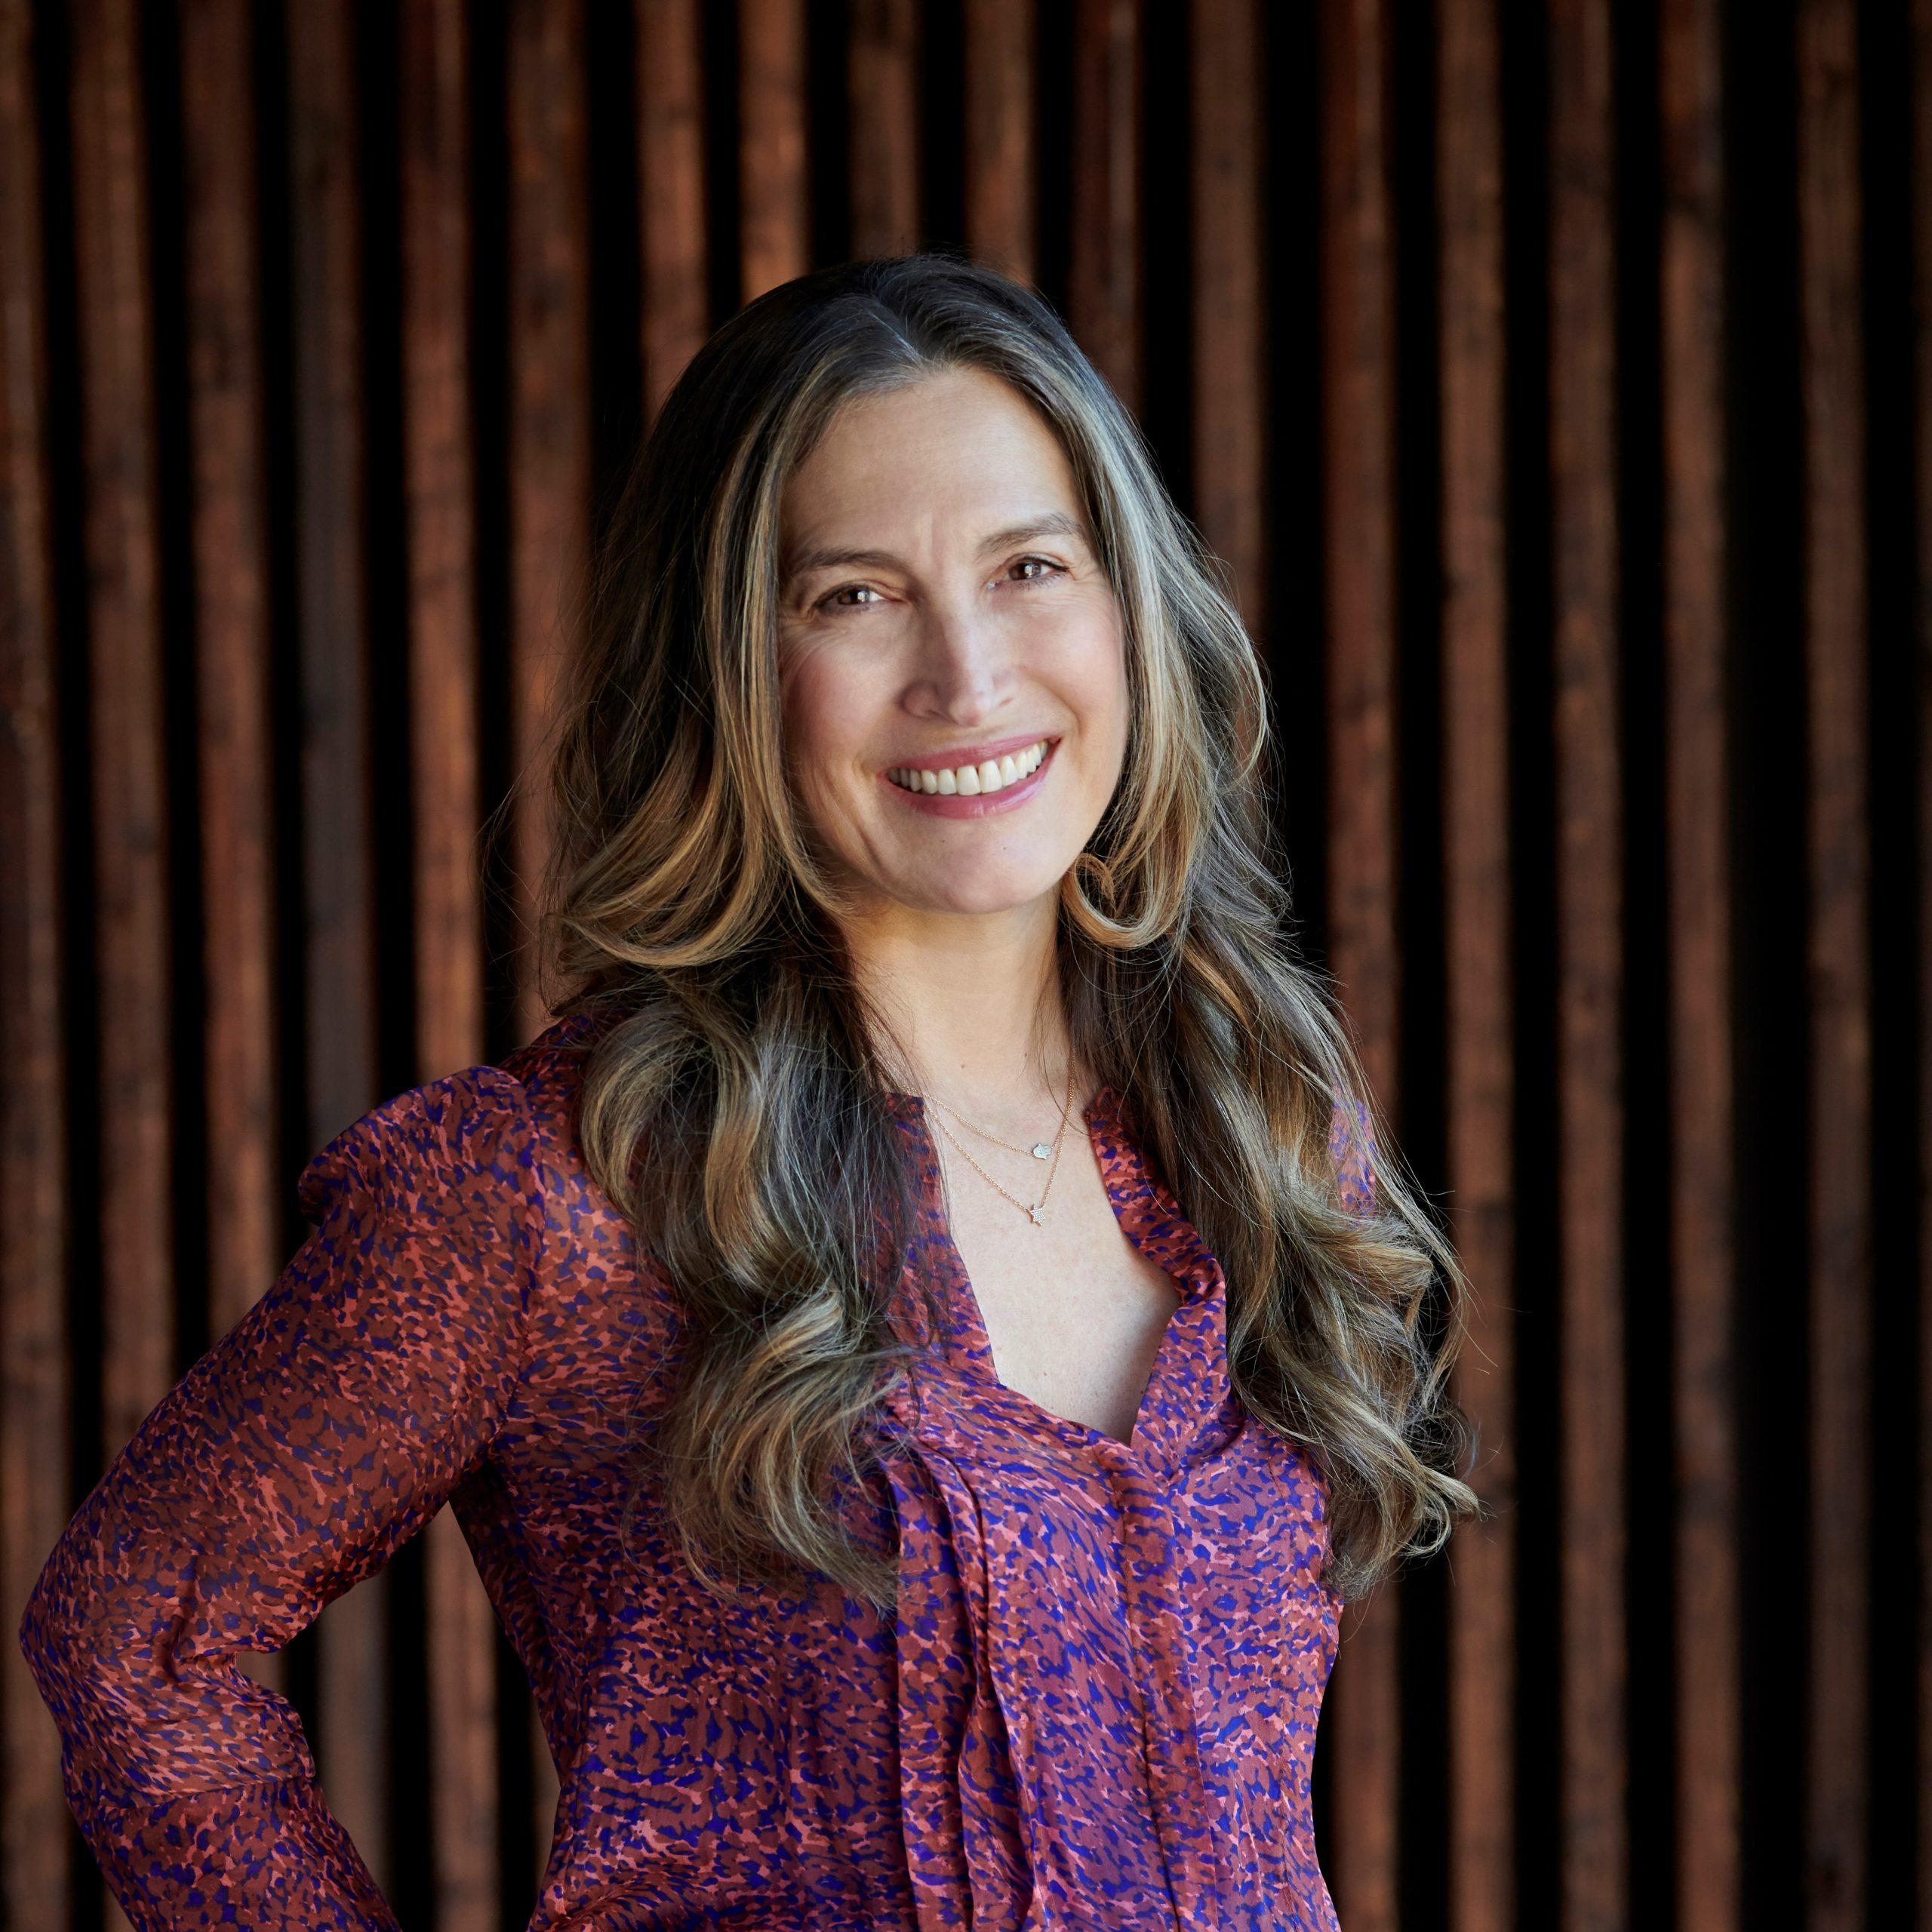 Amy Galper